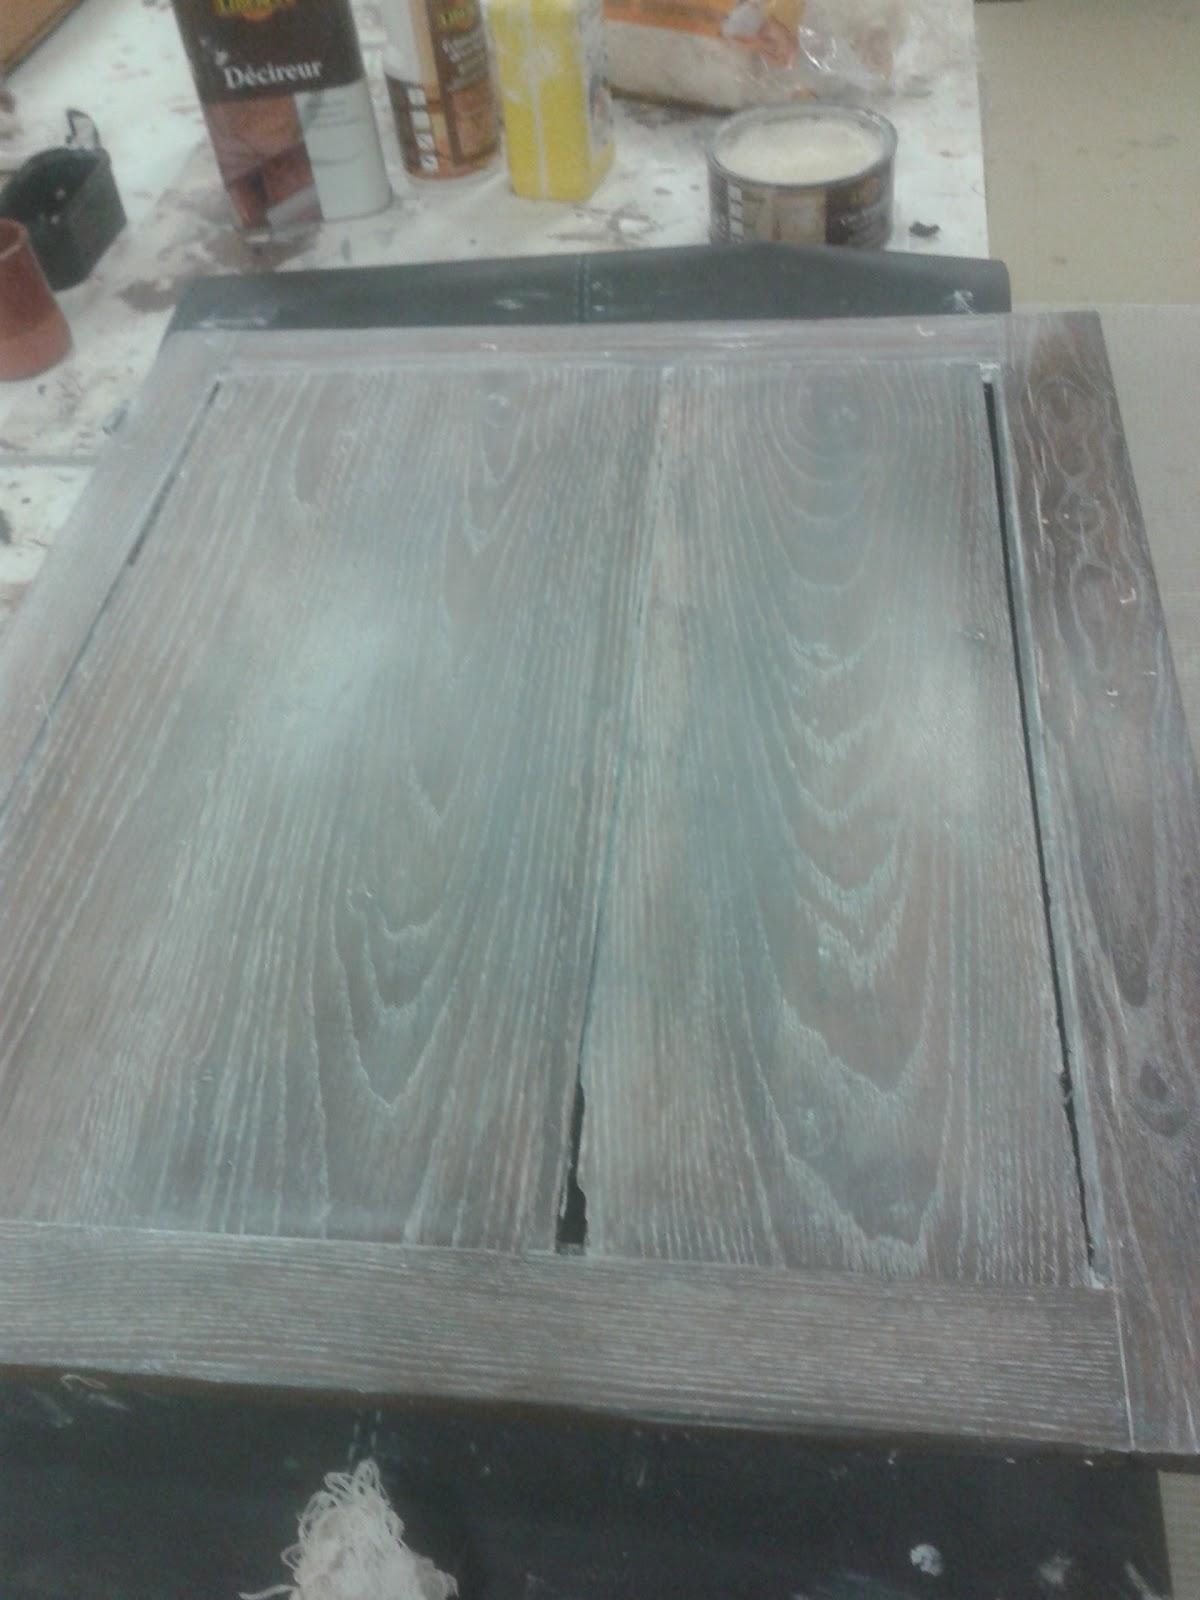 Peinture c rus e leroy merlin resine de protection pour - Peinture leroy merlin pour meuble ...